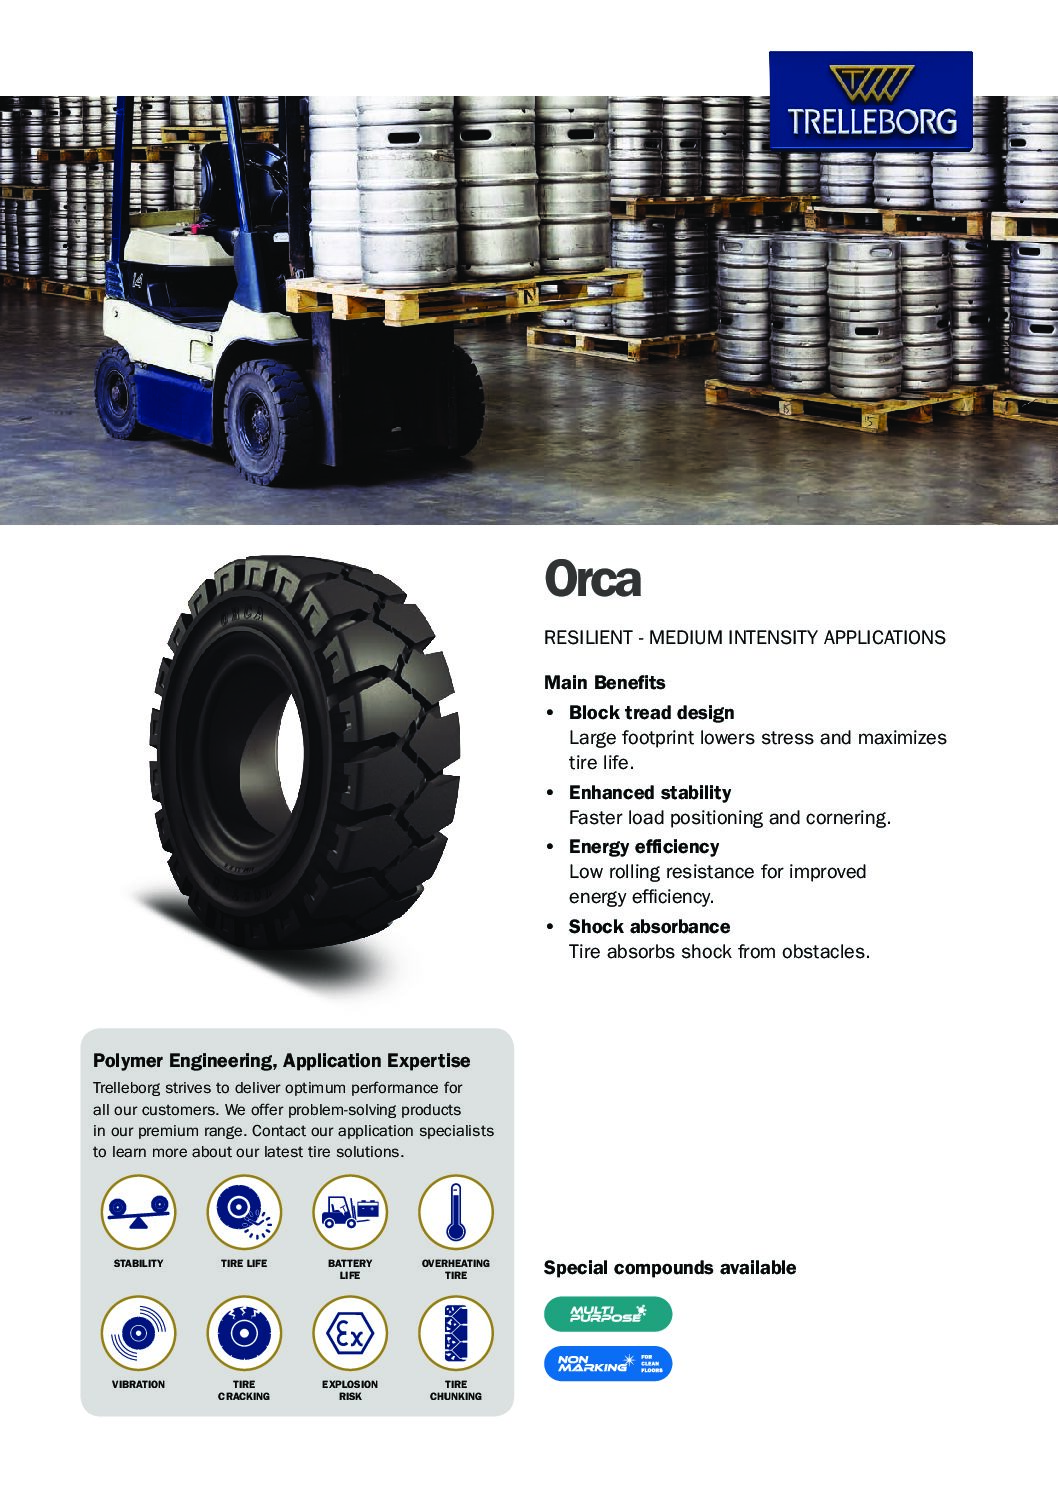 Orca-pdf.jpg